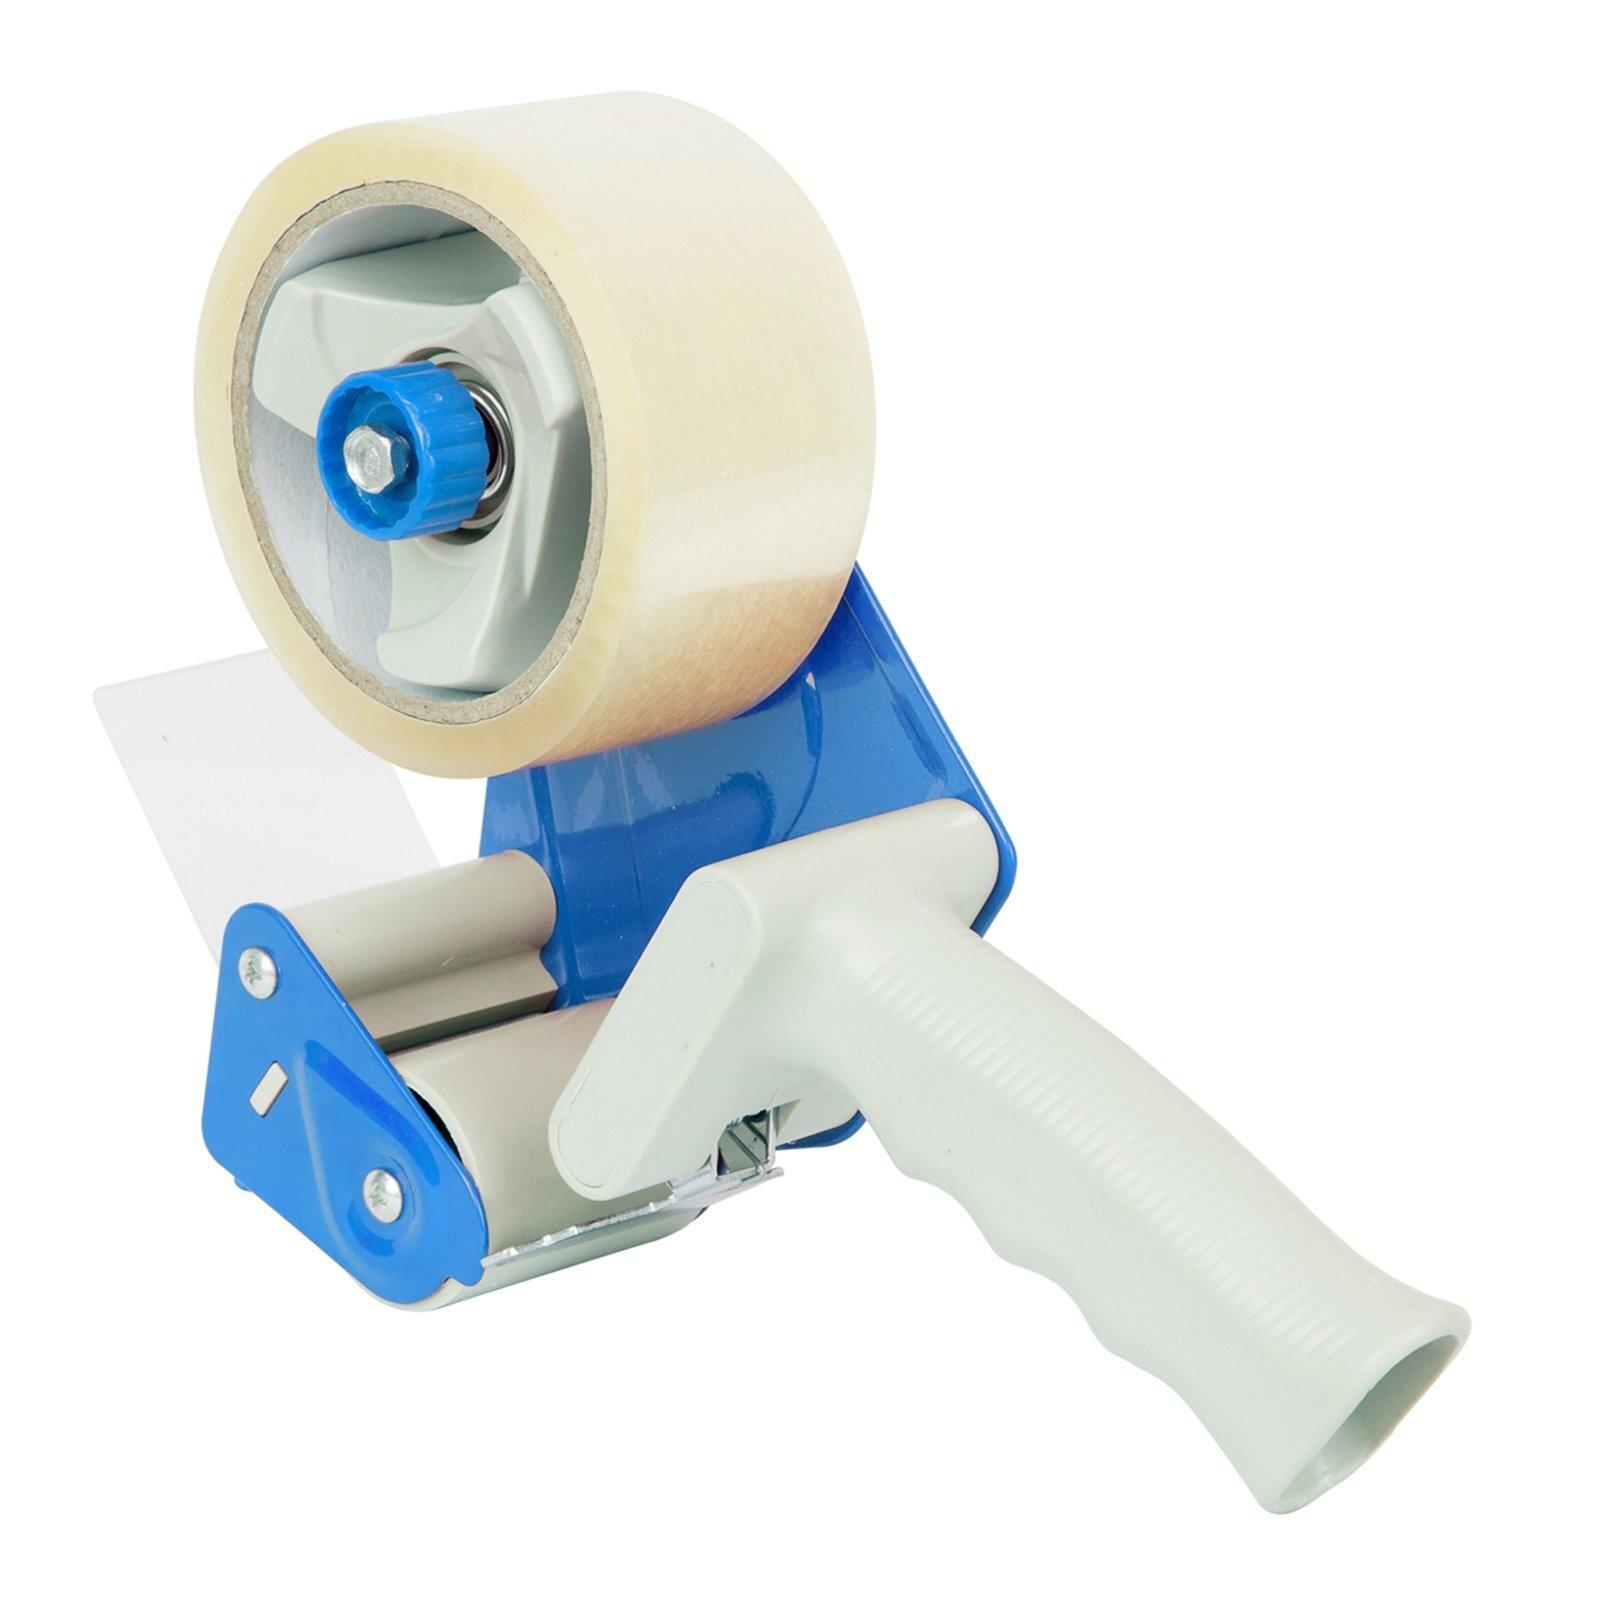 Wrap & Move Tape Dispenser Gun With 2 Tape Rolls